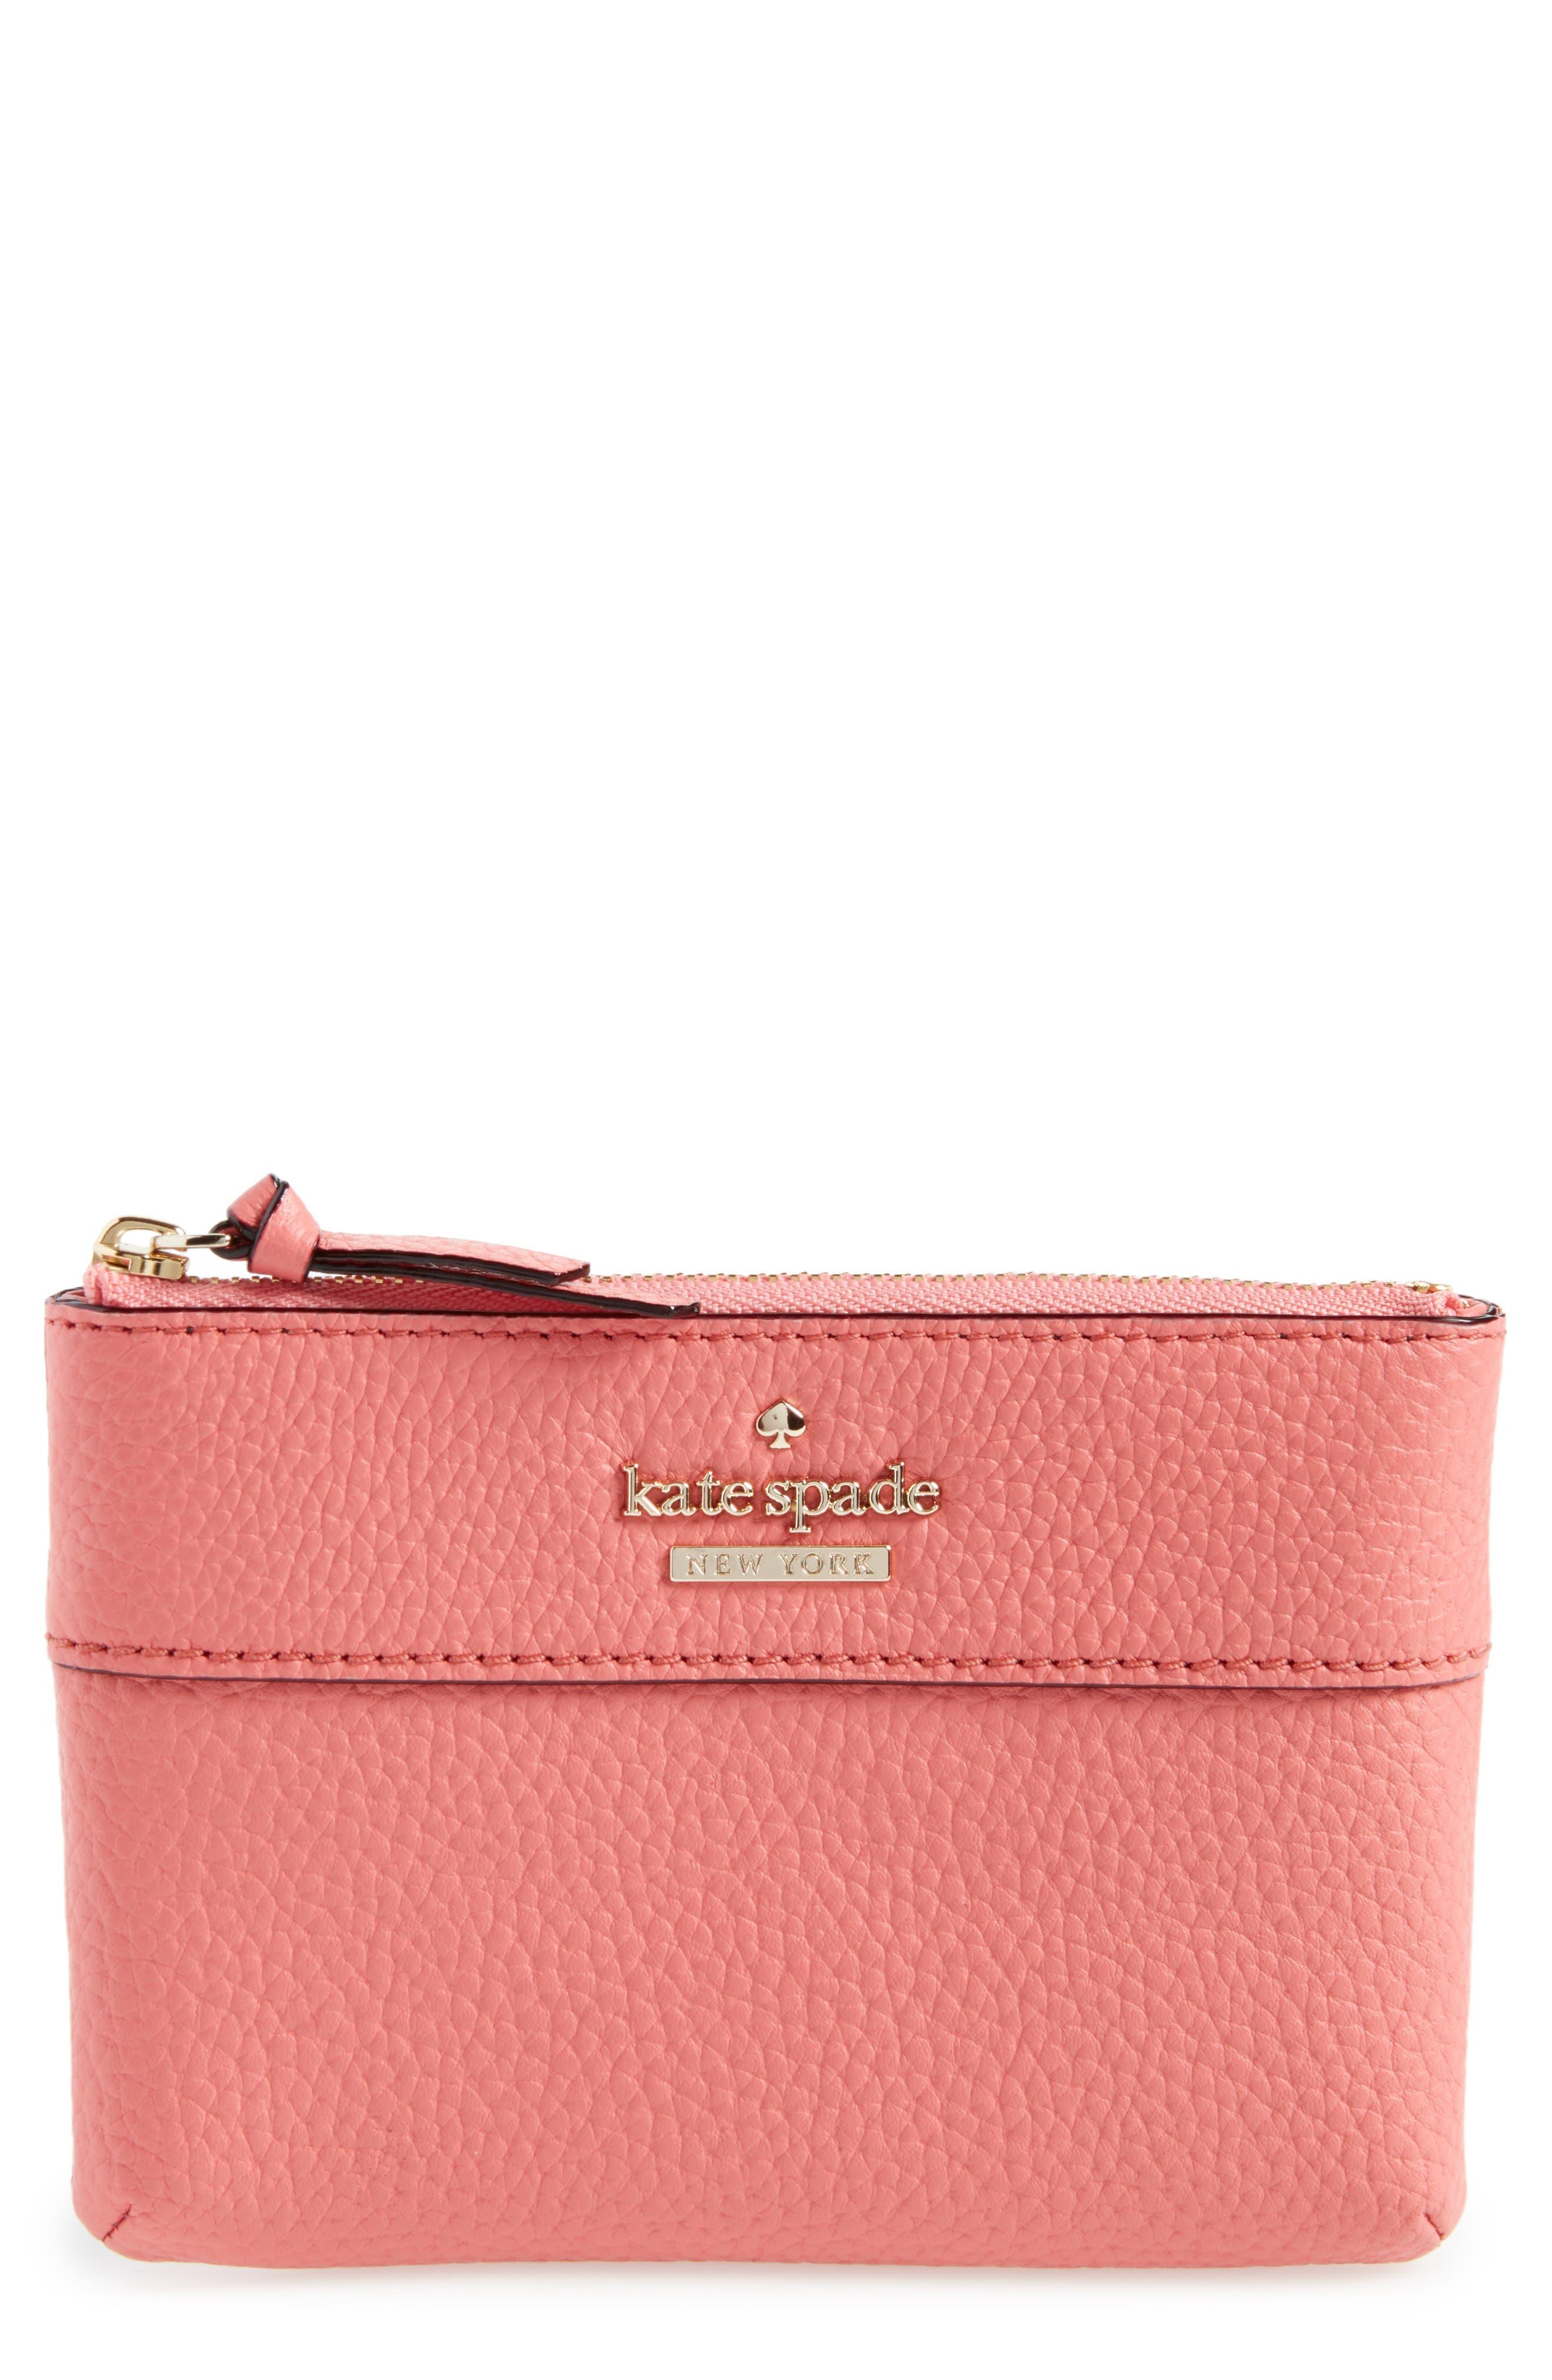 jackson street mila leather zip pouch,                         Main,                         color, Coral Pebble